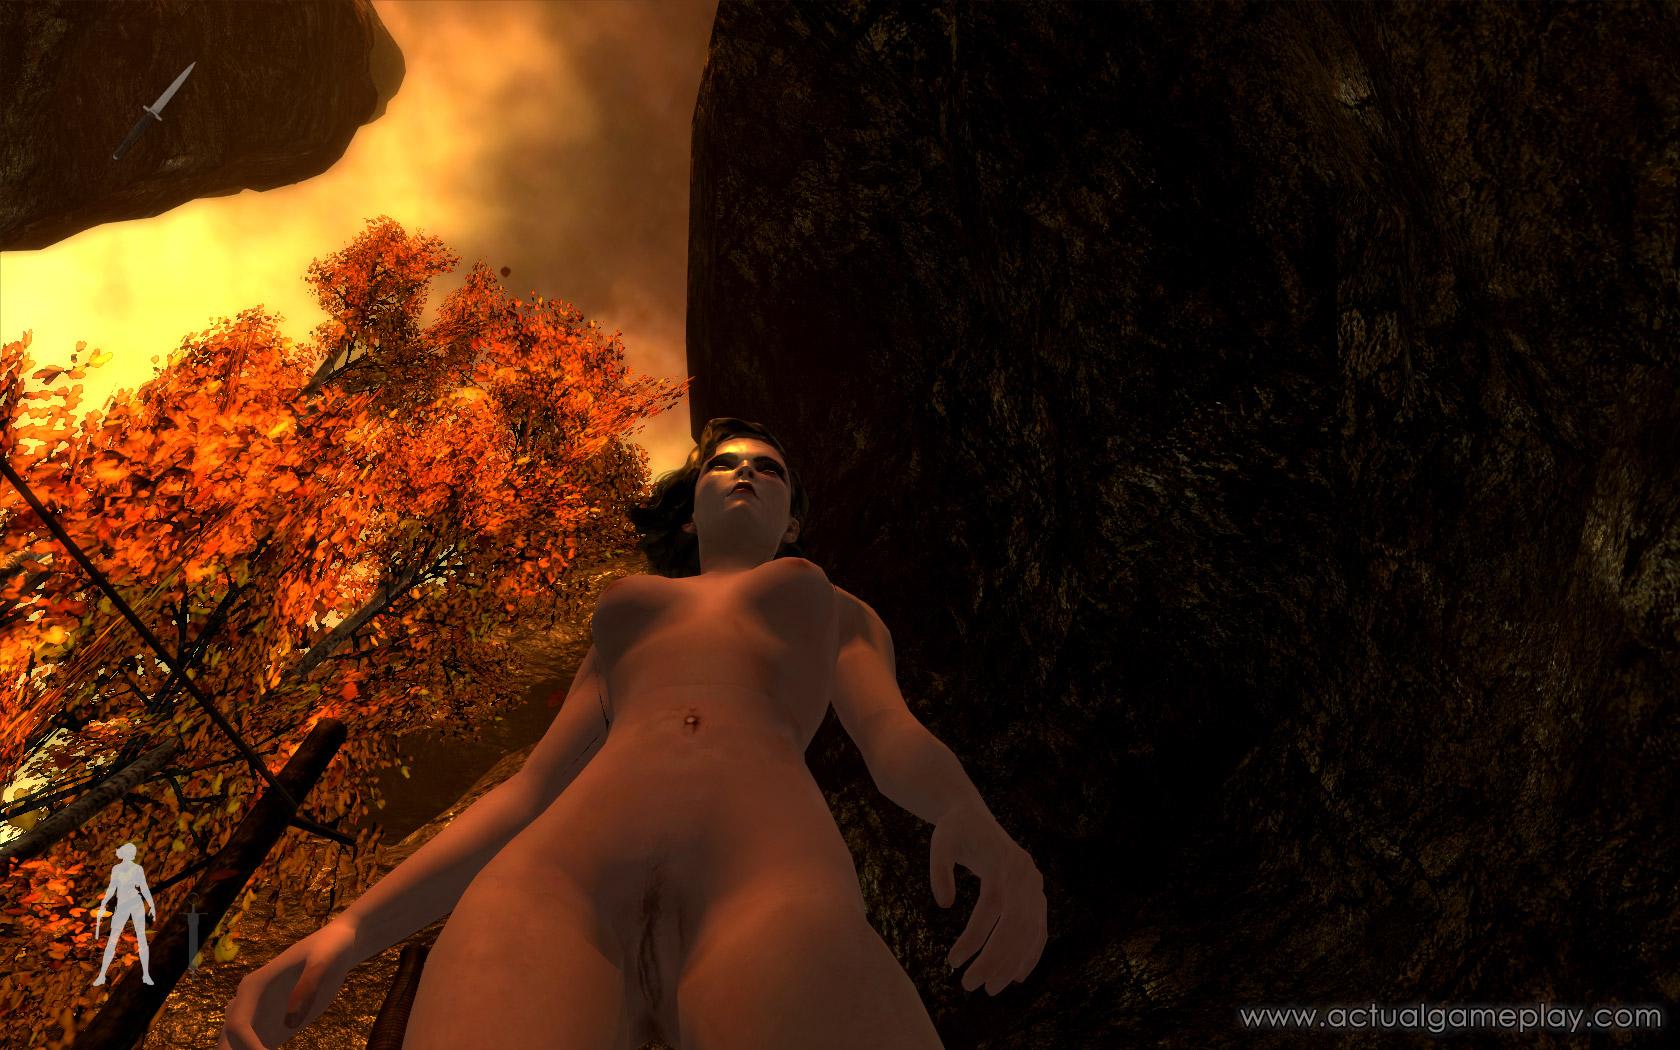 Velvet Assassin Nude Patch Actual Gameplay